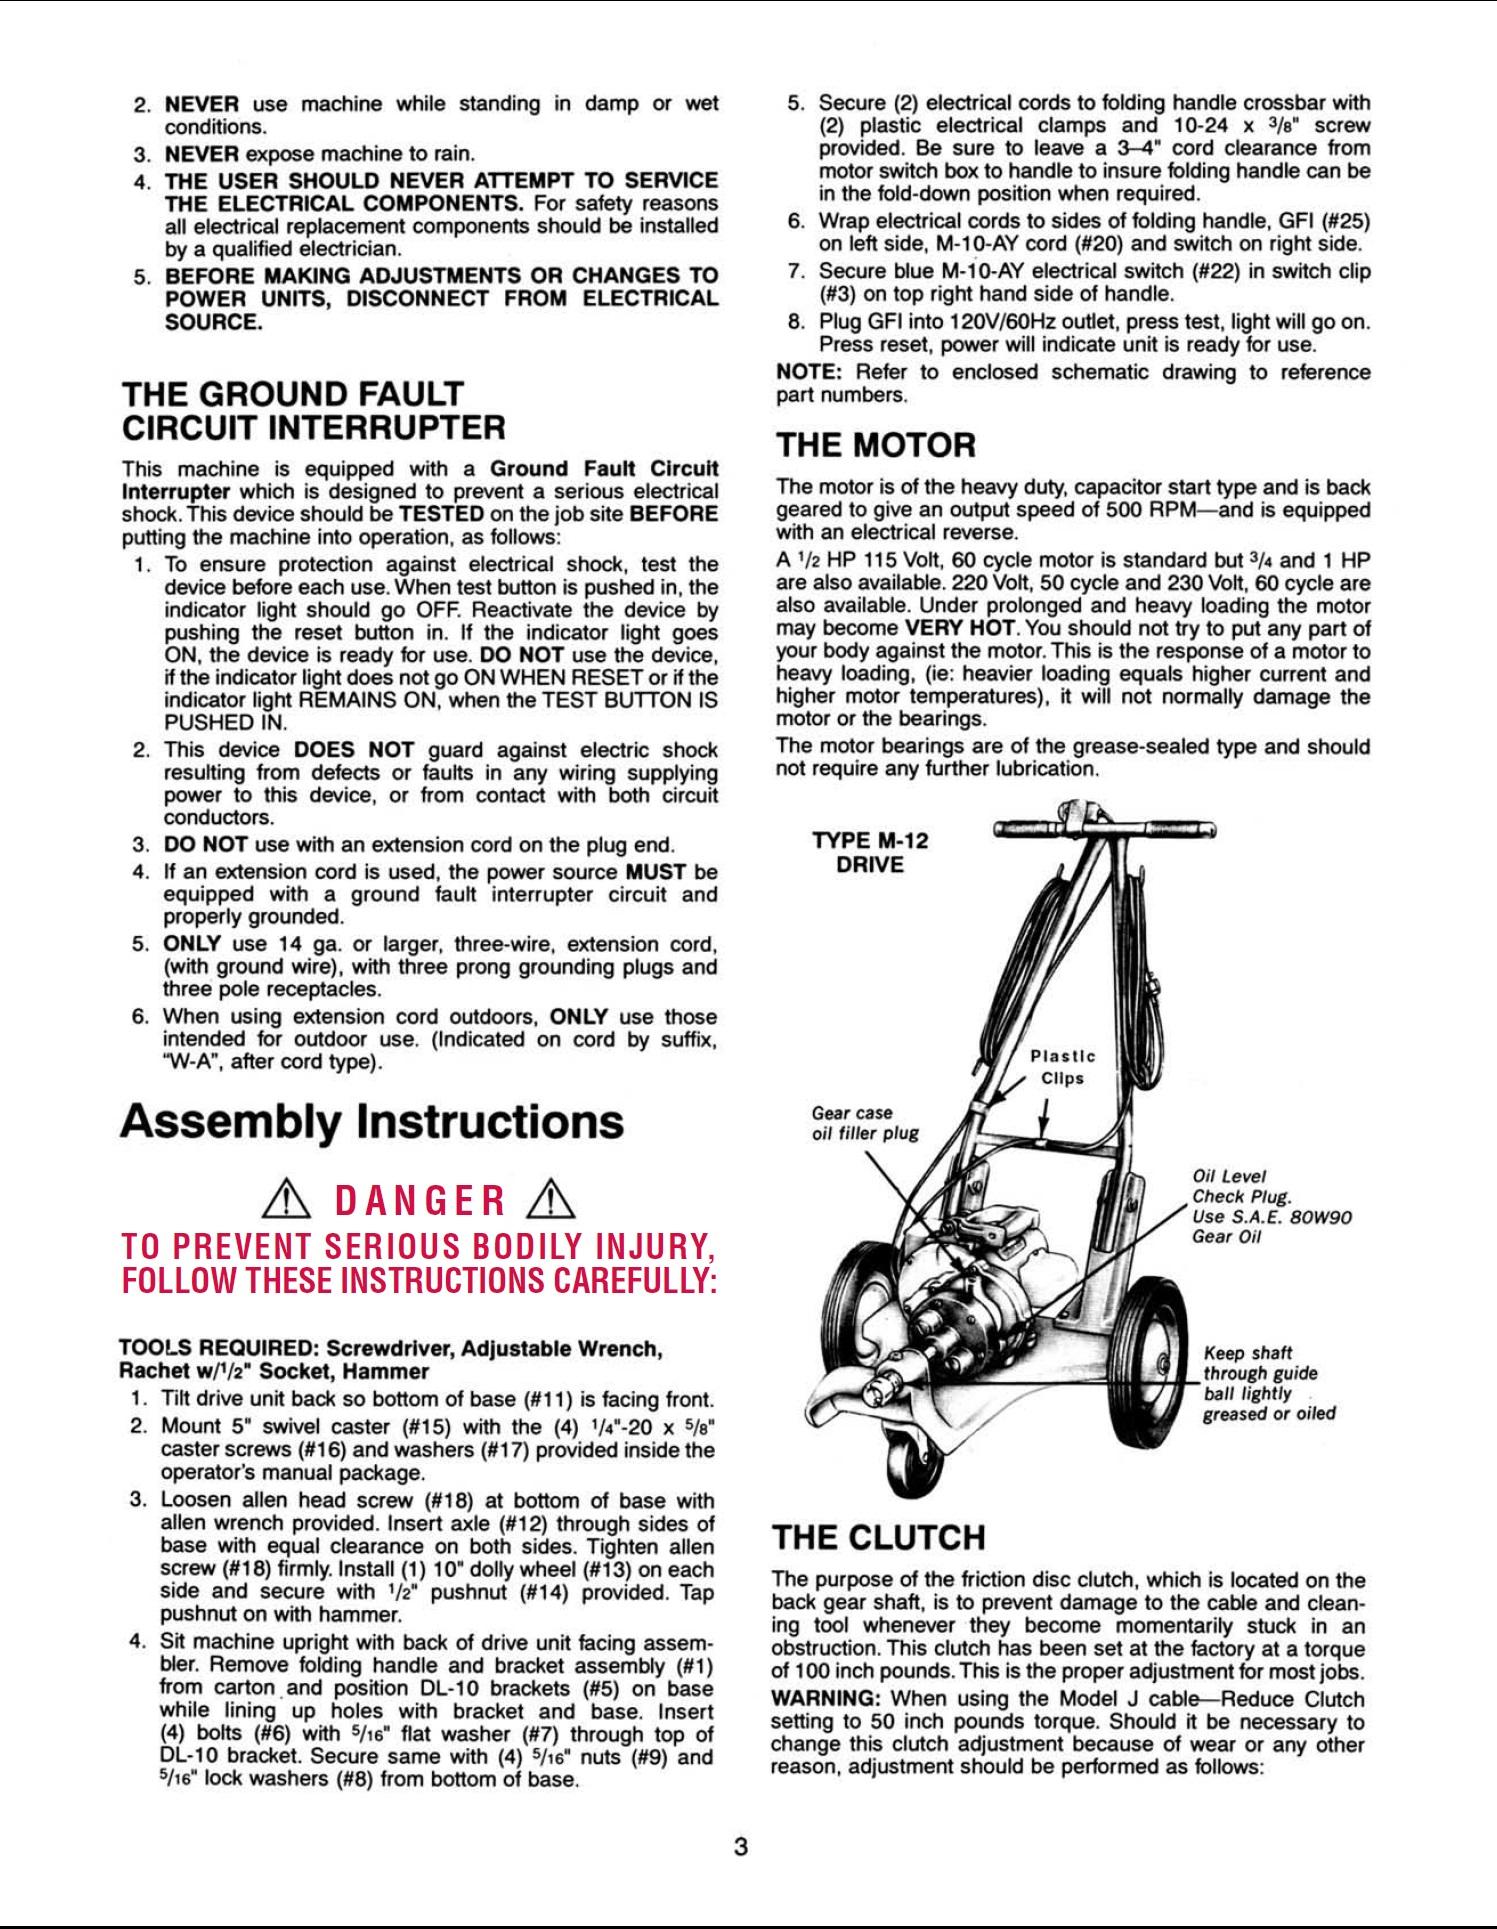 model-c-operating-manual-page-3.jpg